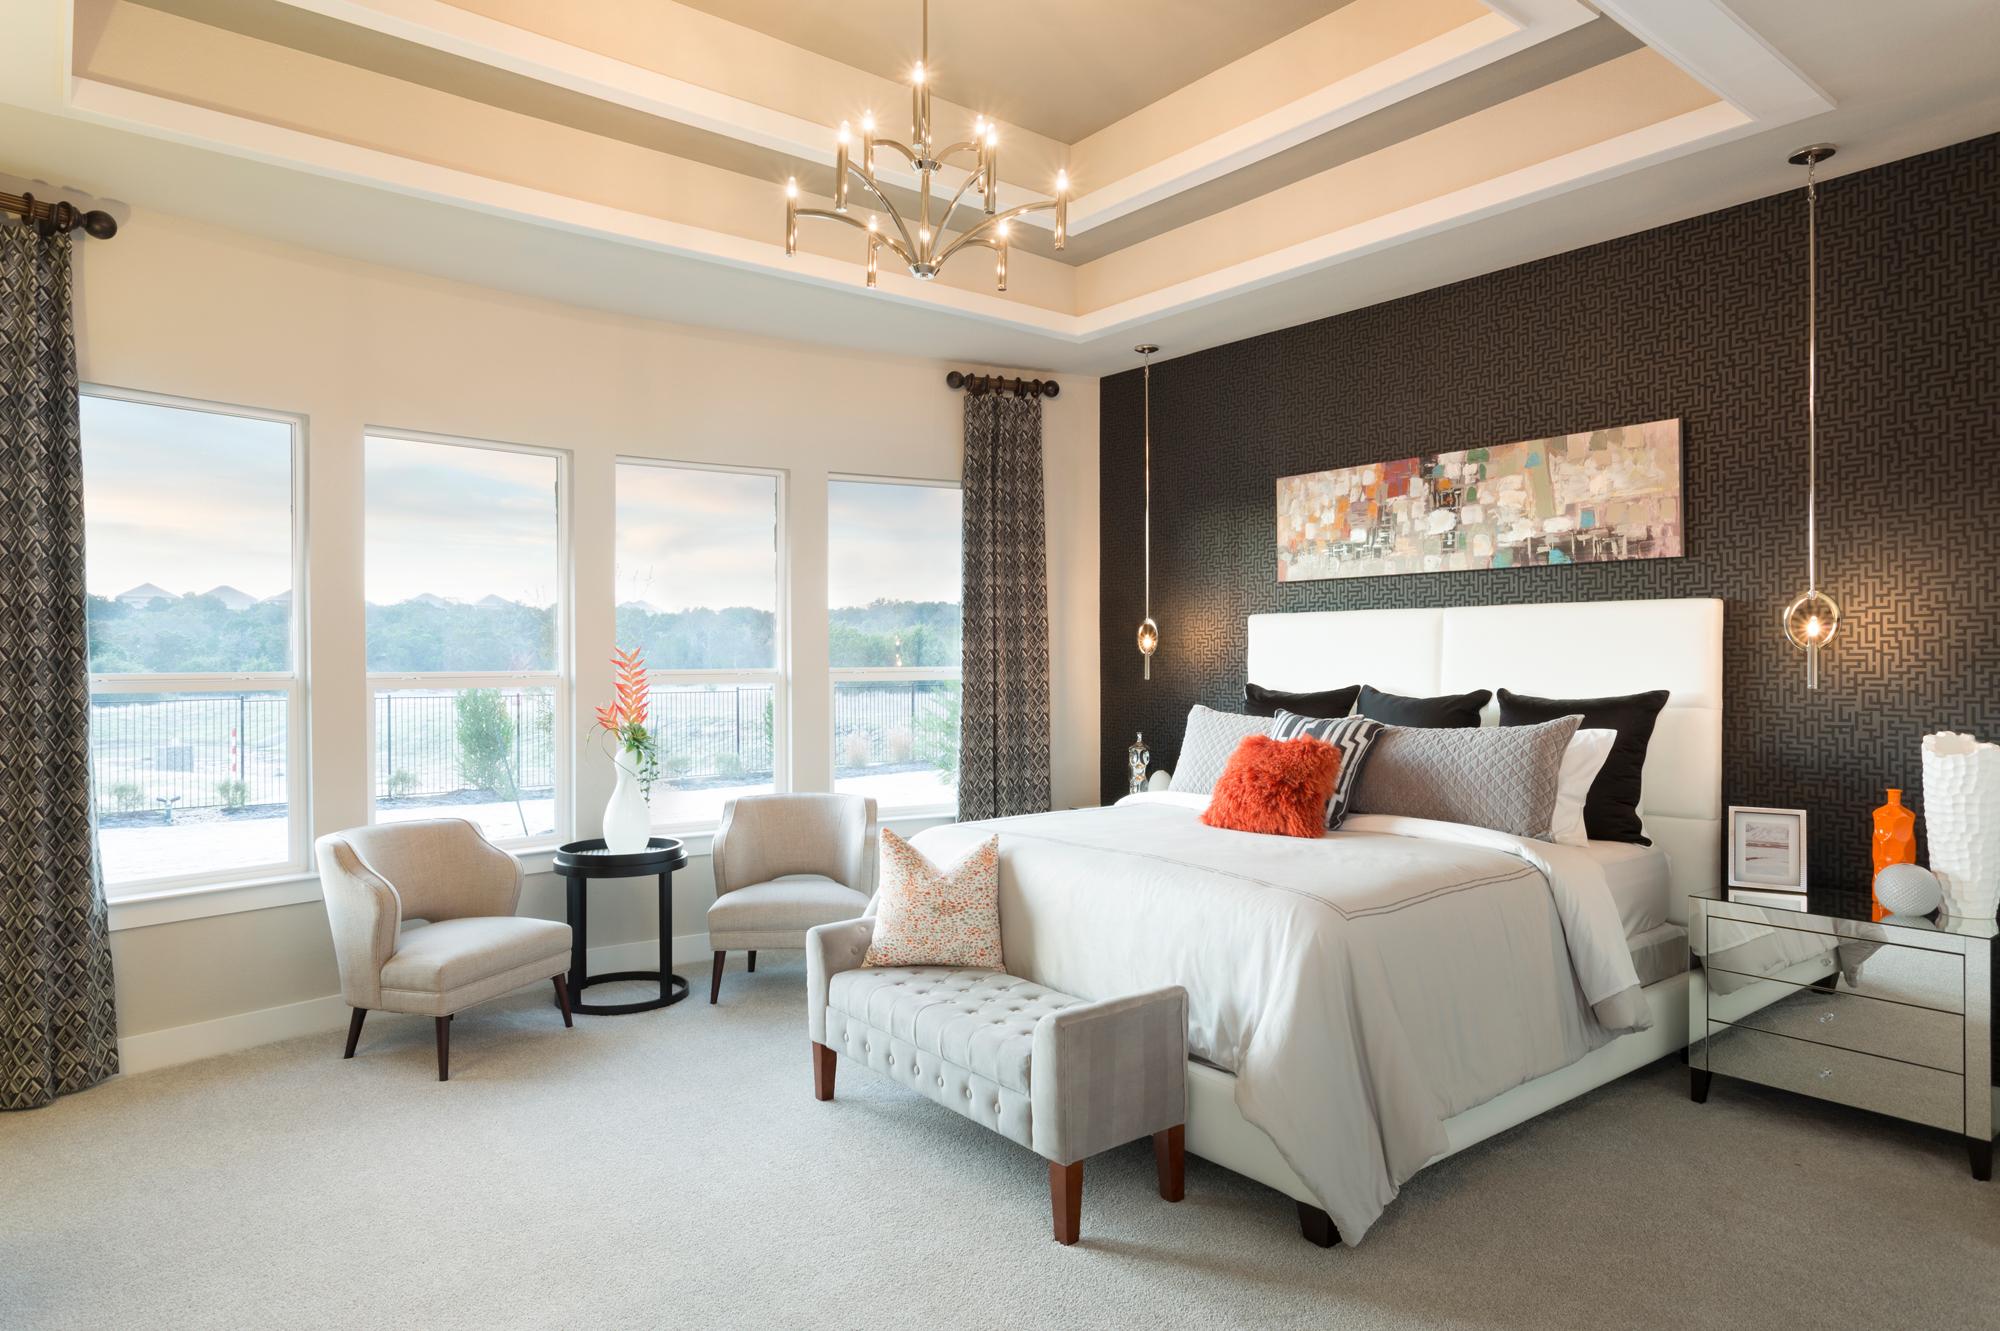 residential-interior-photography.jpg